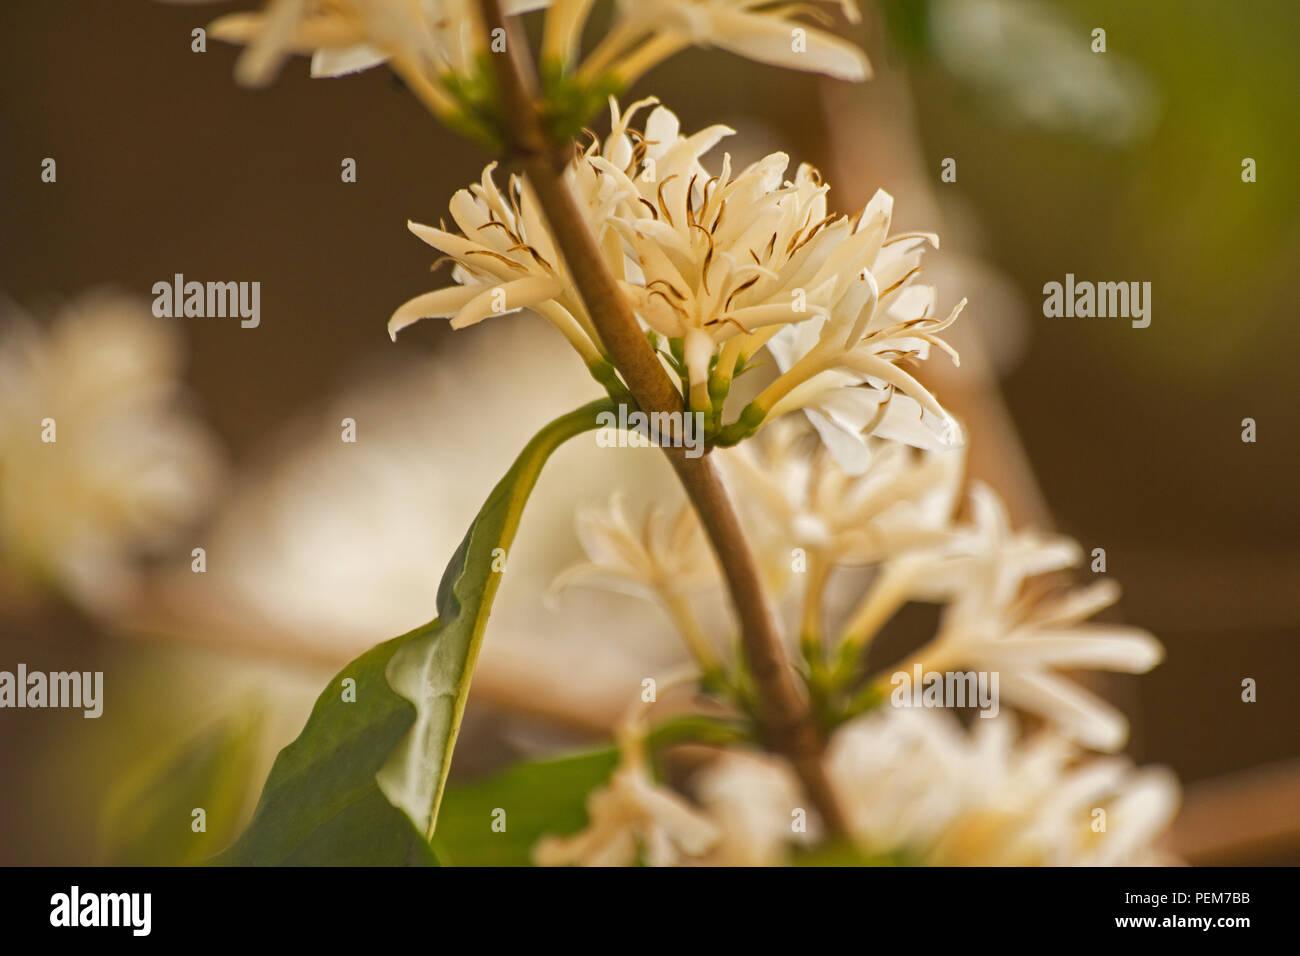 Coffea Arabica plant in flower - Stock Image